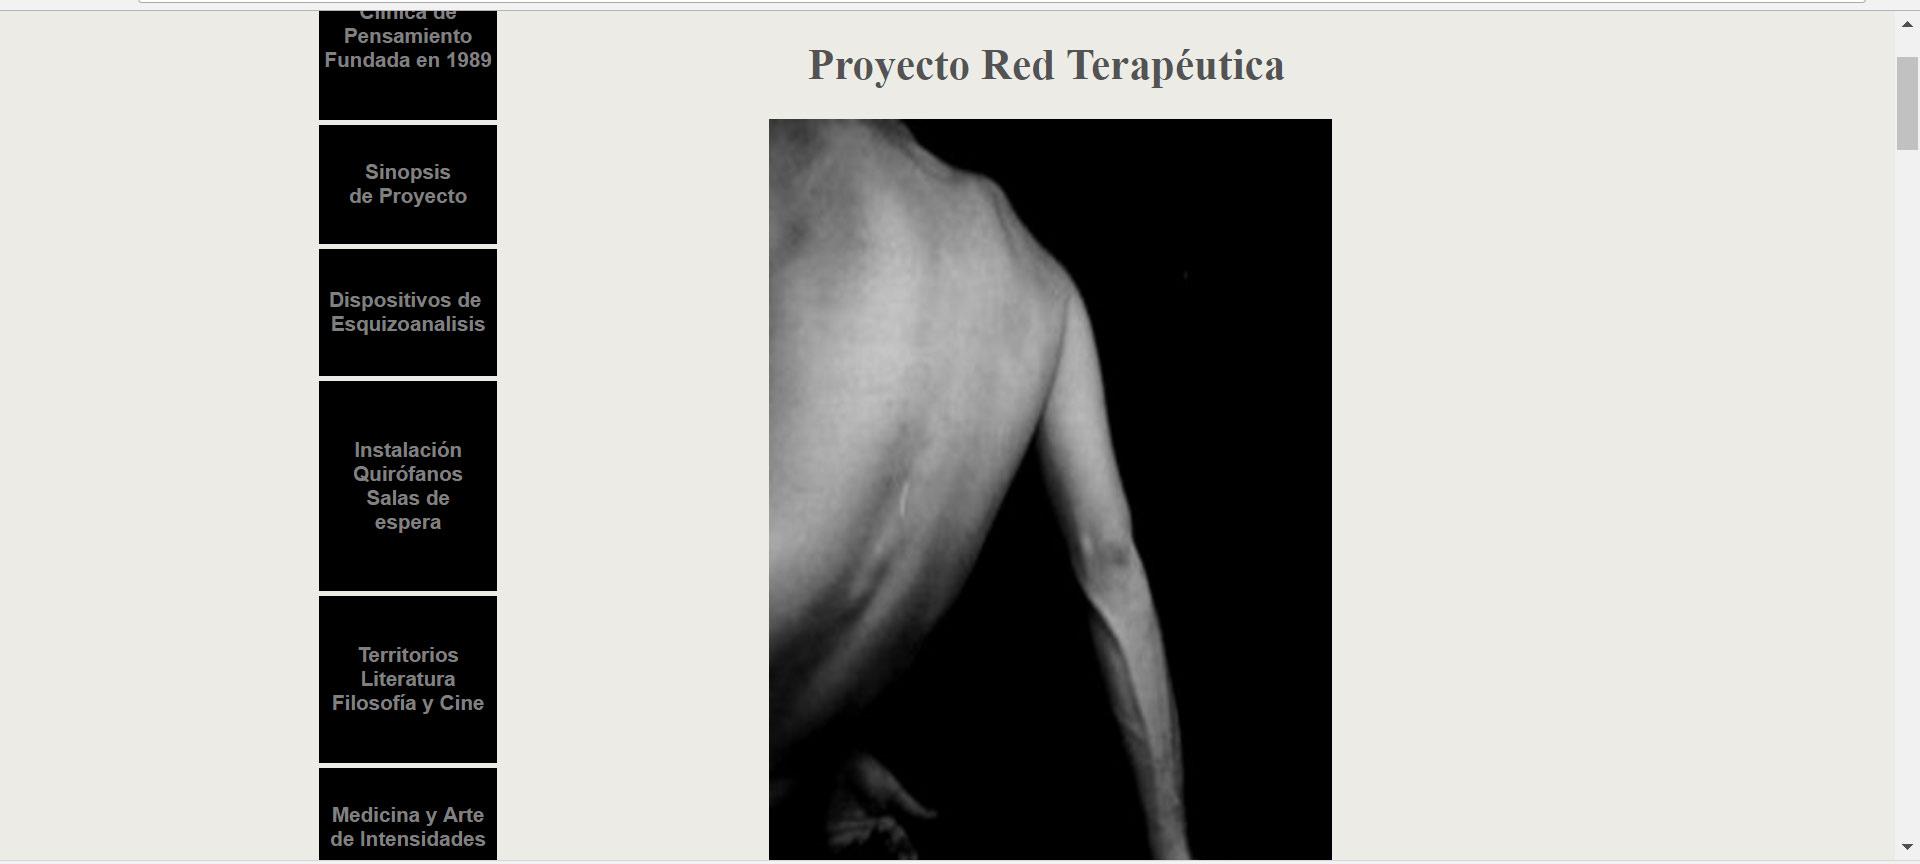 http://medicinayarte.com/img/proyecto_red_terapeutica.jpg